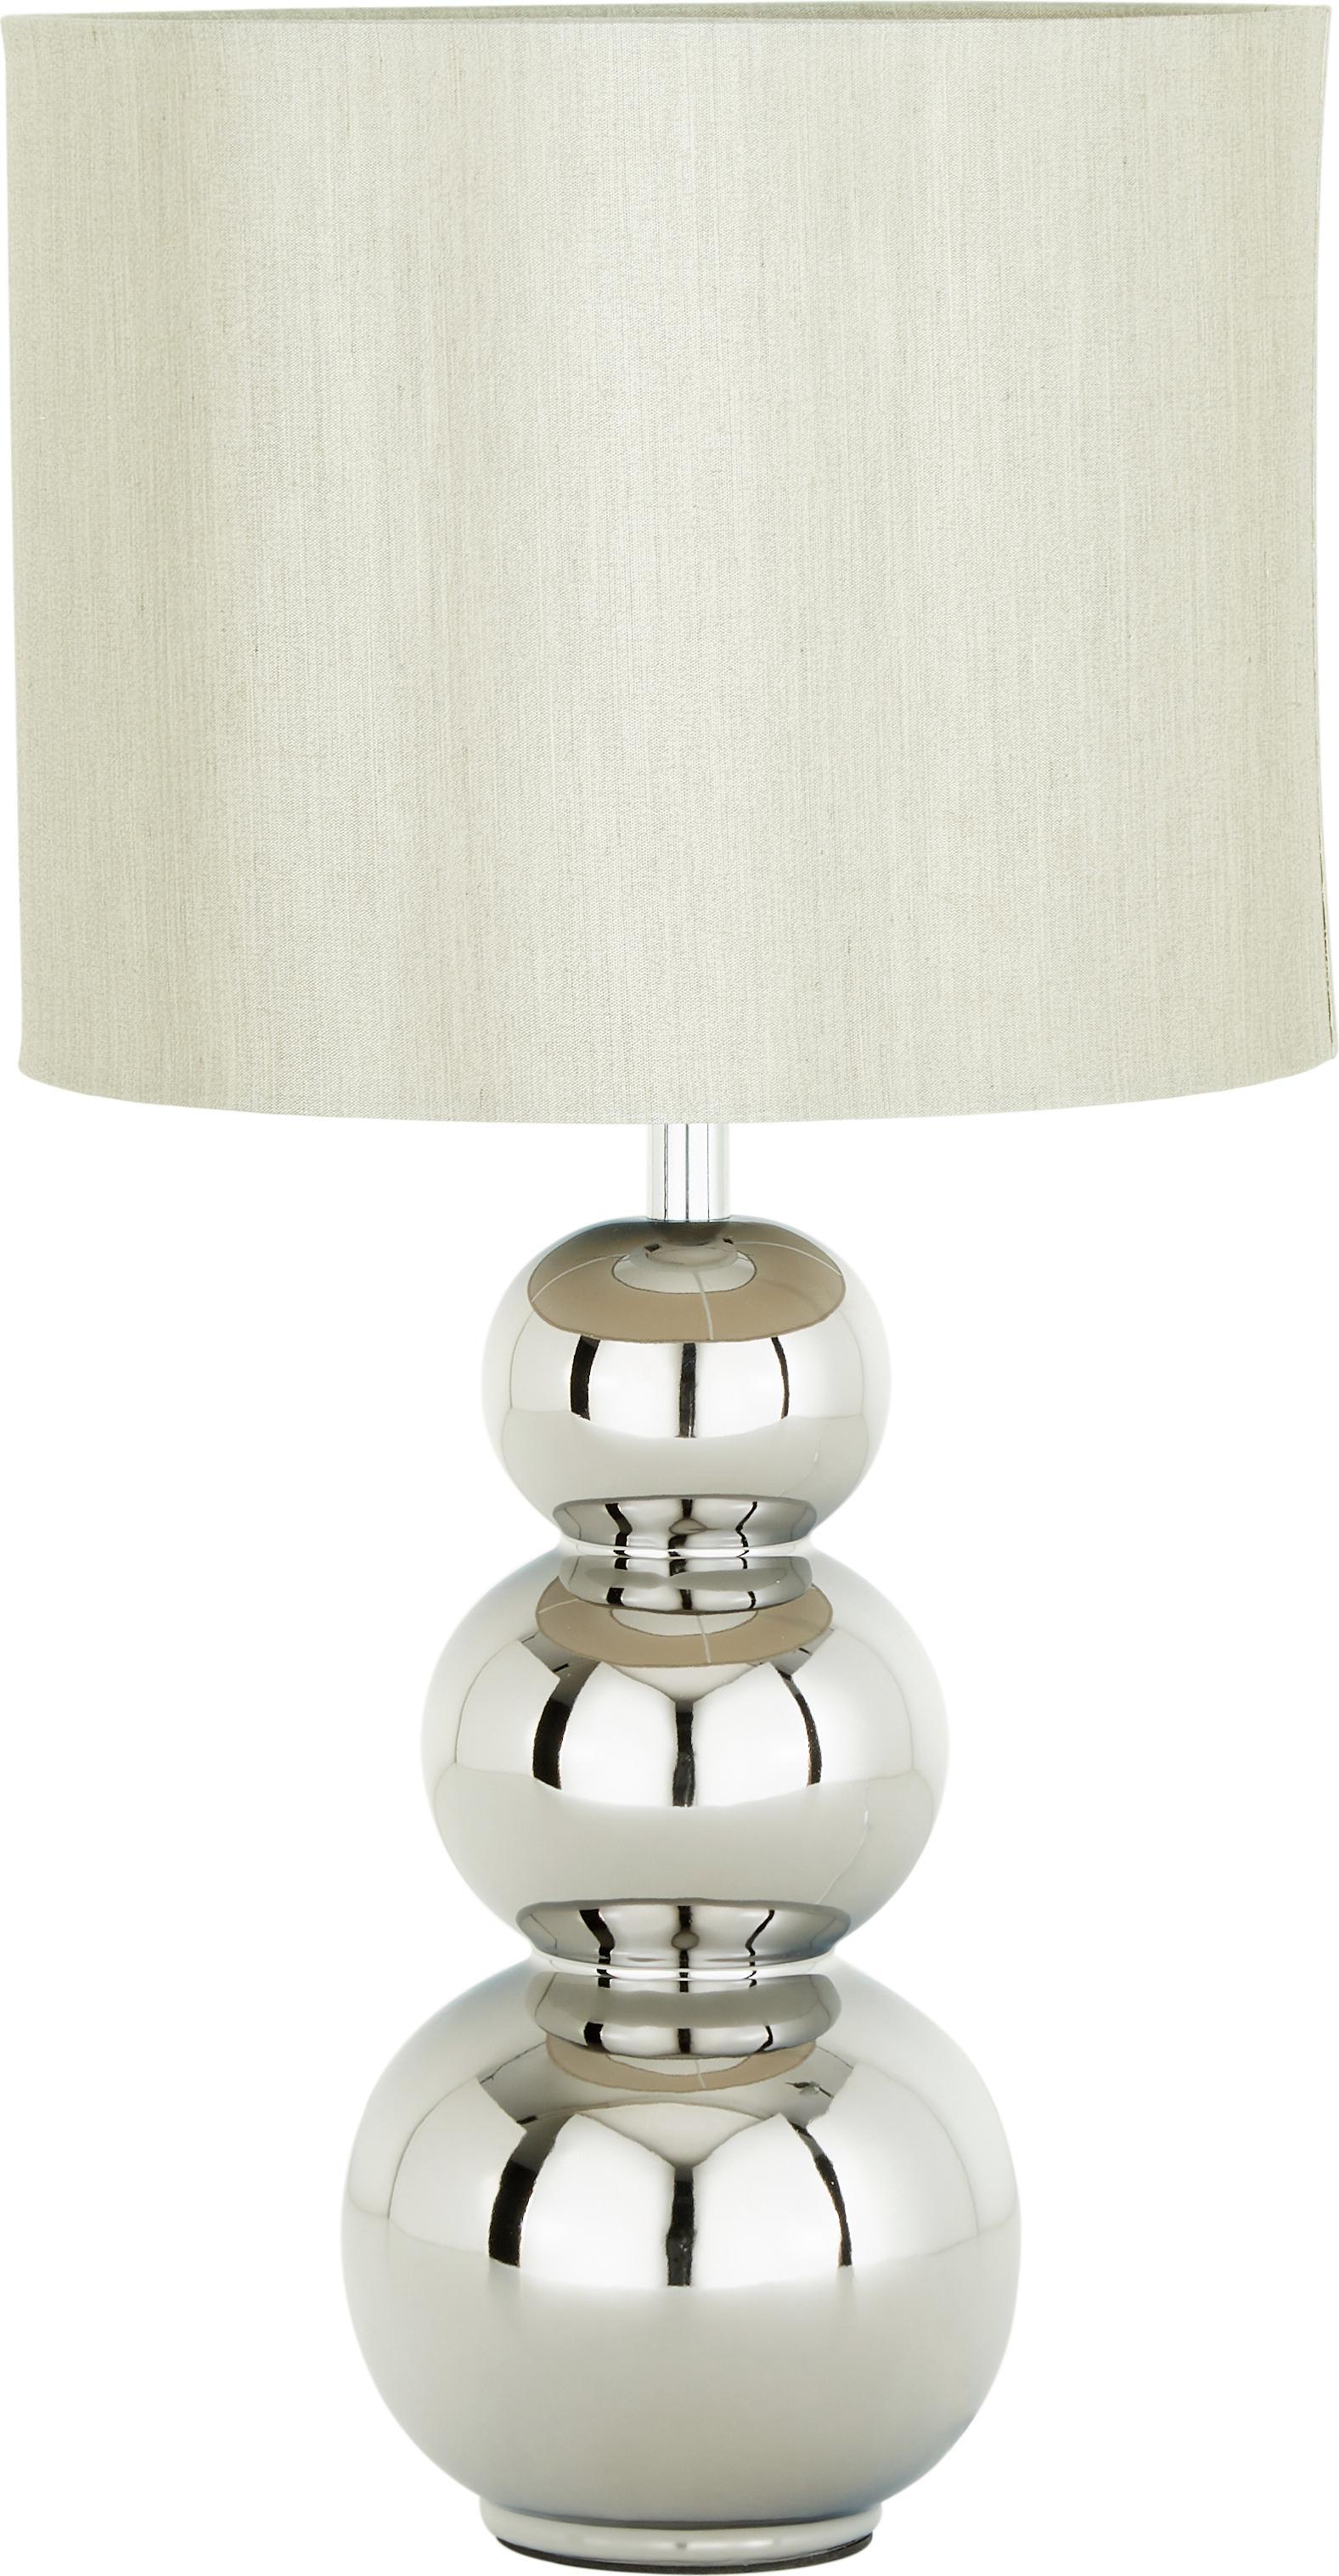 Tafellamp Regina, Lampenkap: textiel, Lampvoet: keramiek, Fitting: verchroomd metaal, Taupe, chroomkleurig, Ø 25 x H 49 cm